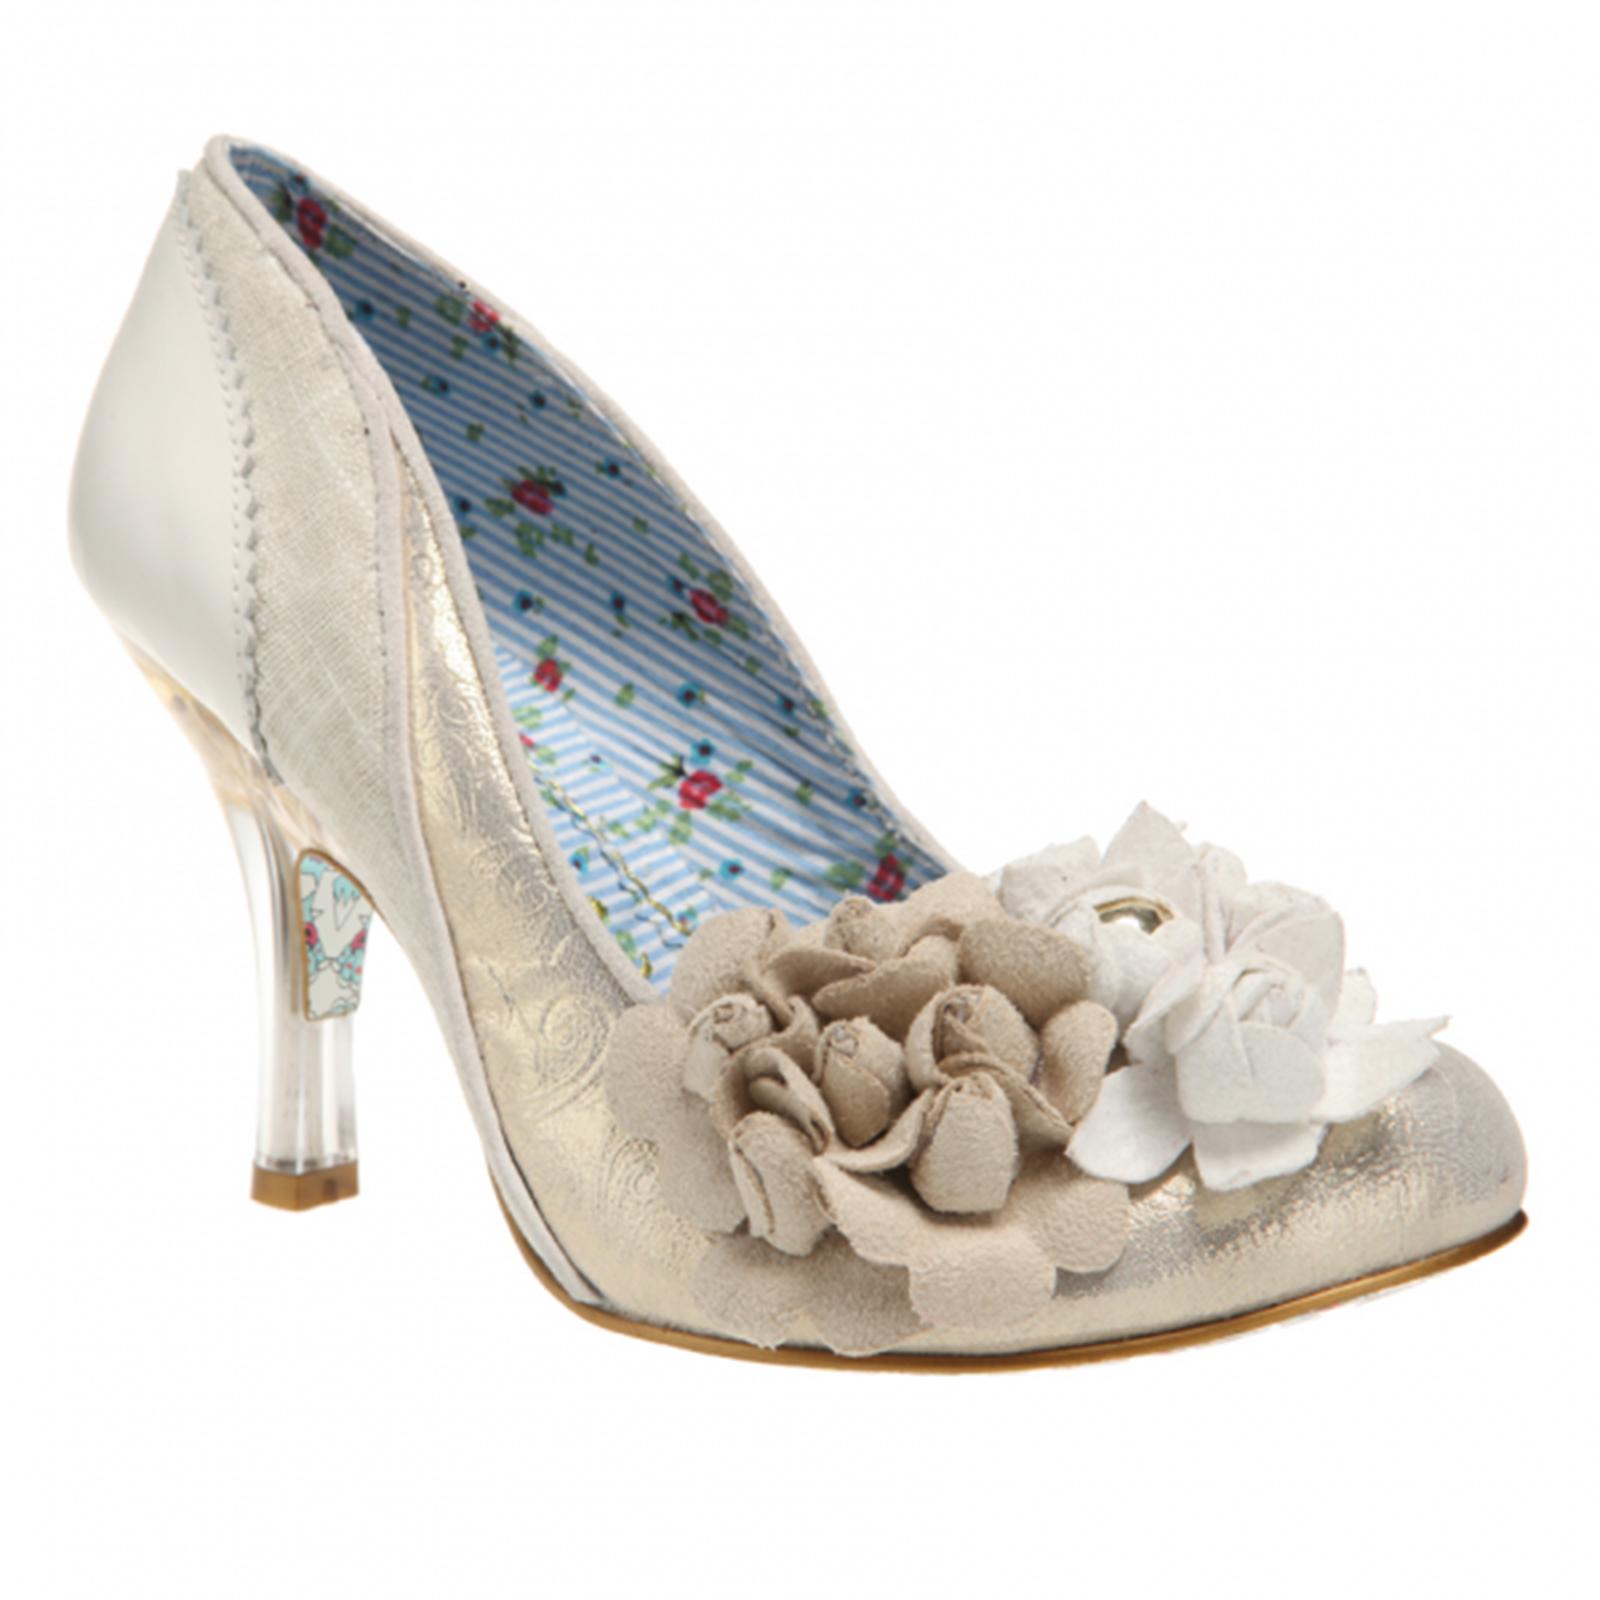 Irregular Choice Mrs Lower Ivory Gold Vintage Style High Heel Wedding Shoes  Thumbnail 2